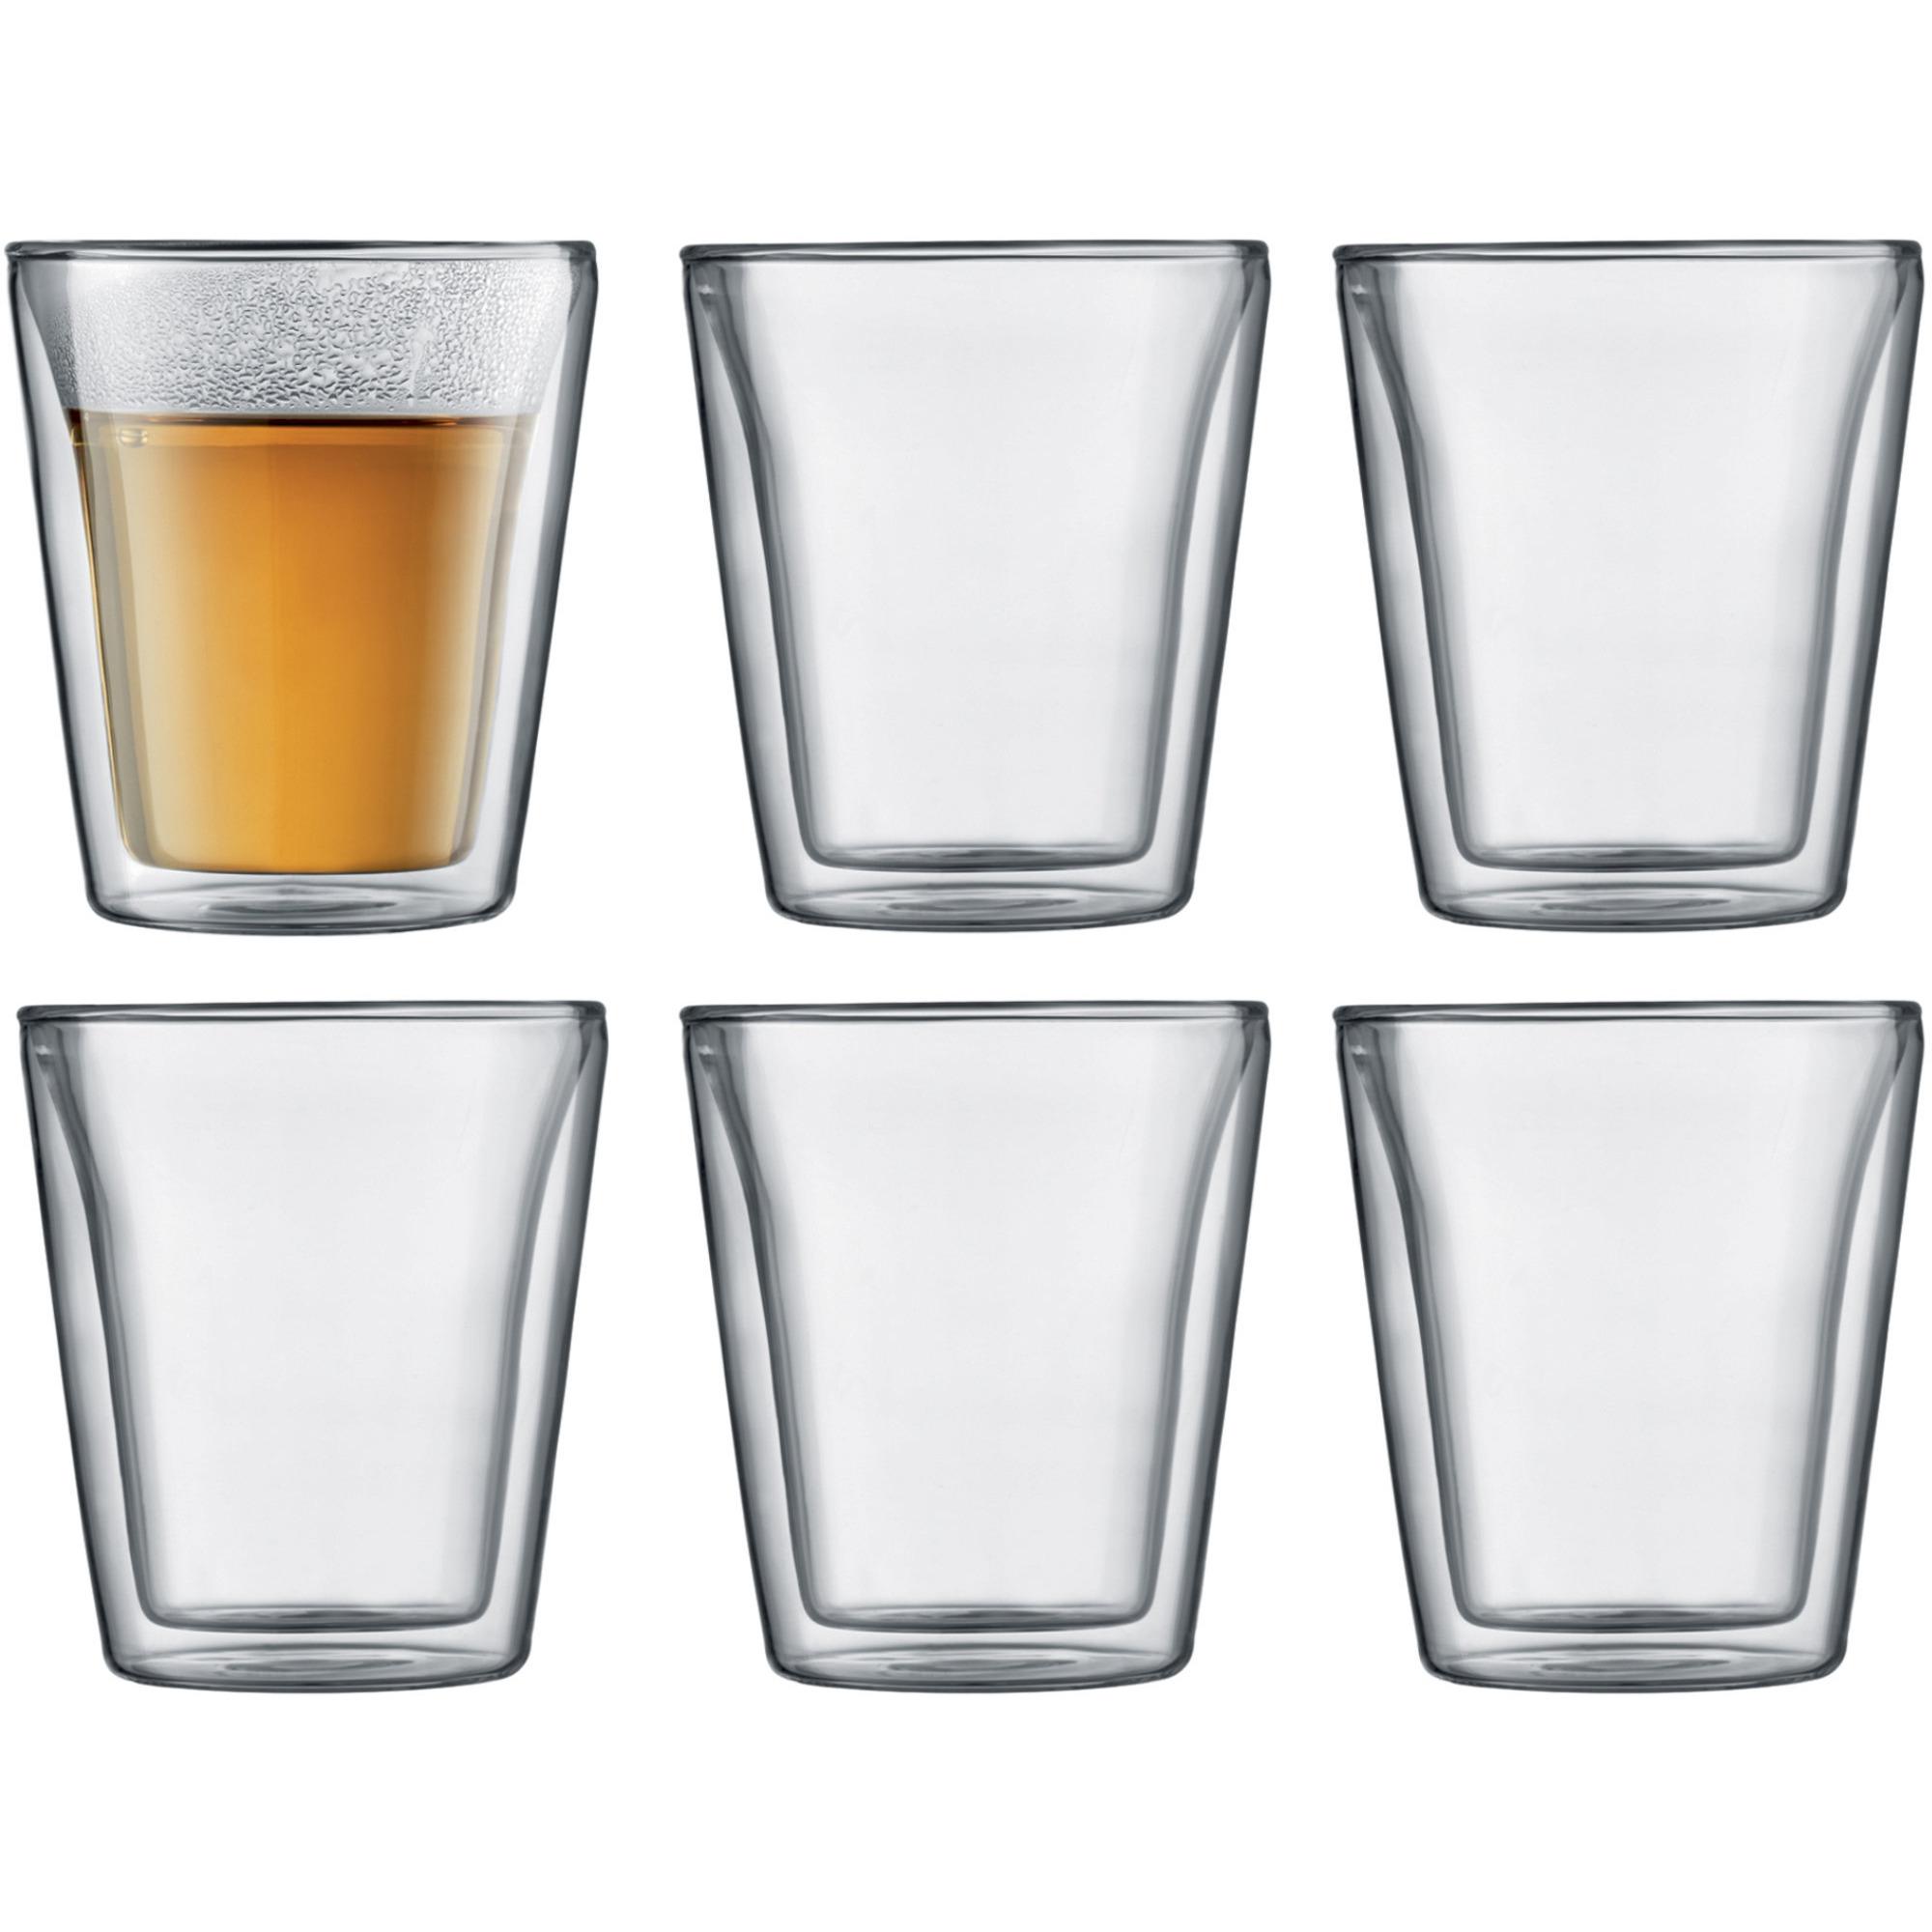 Bodum Canteen Dubbelväggigt Glas Medium 6 pack